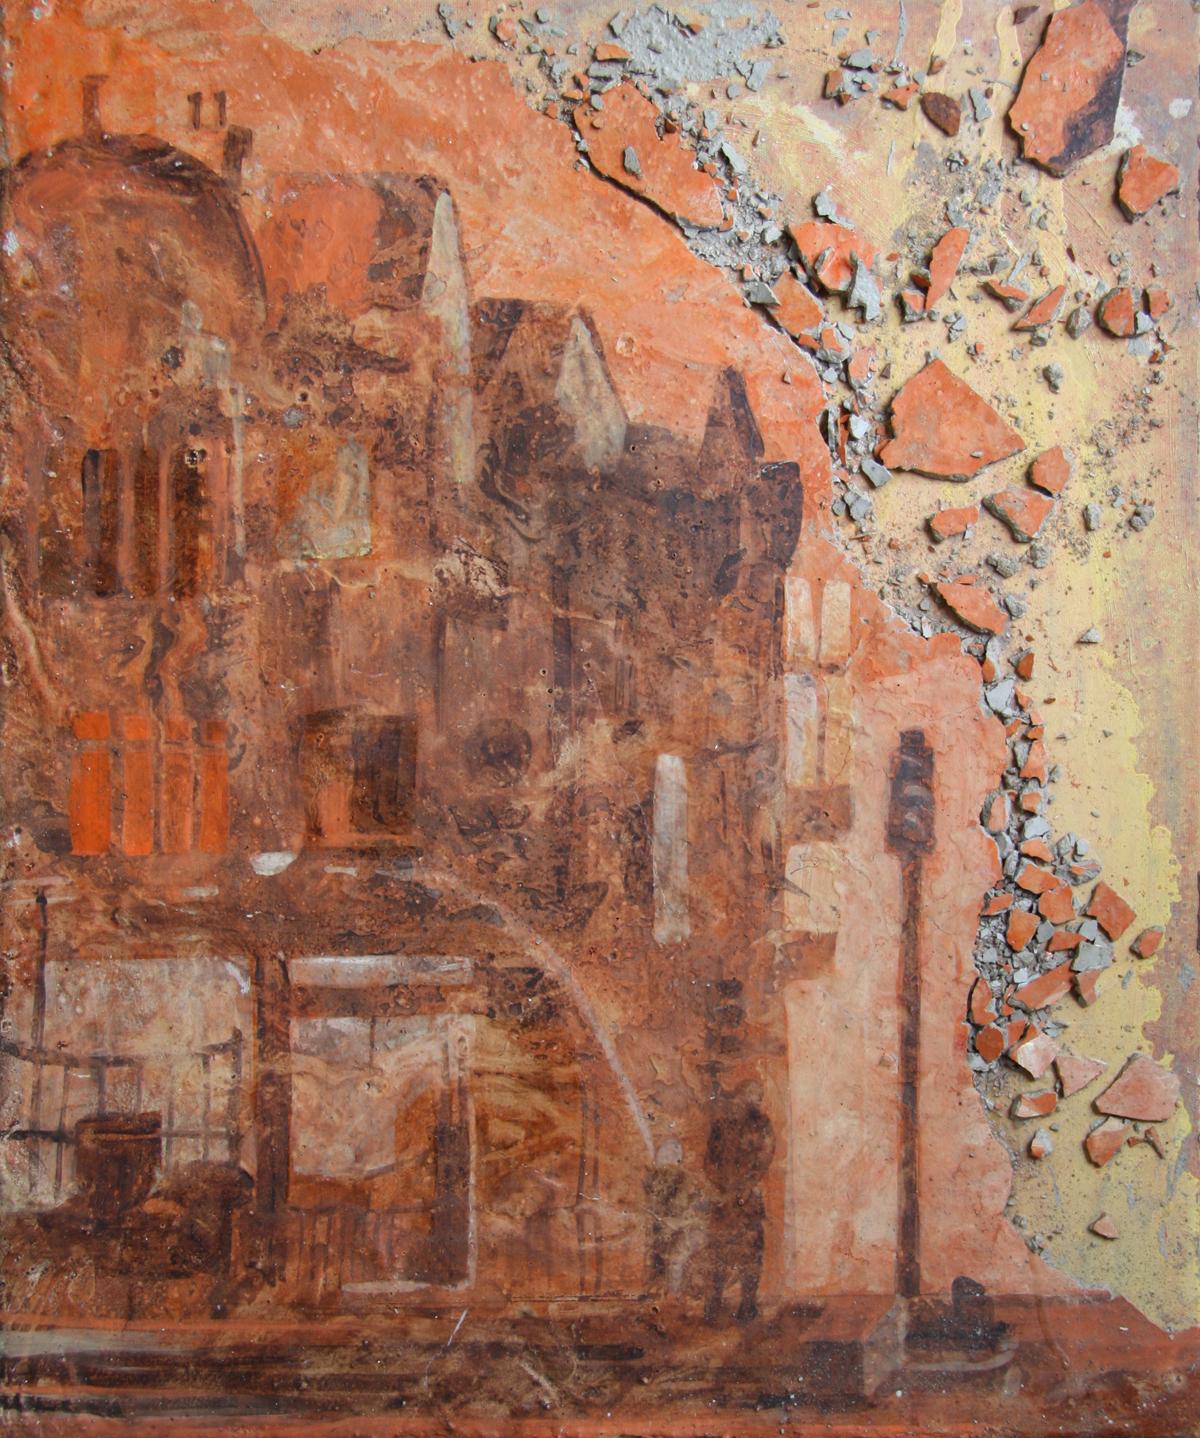 Croydon 2011 (2011), Fiona Long, oil and concrete on canvas, 50 x 60 cm